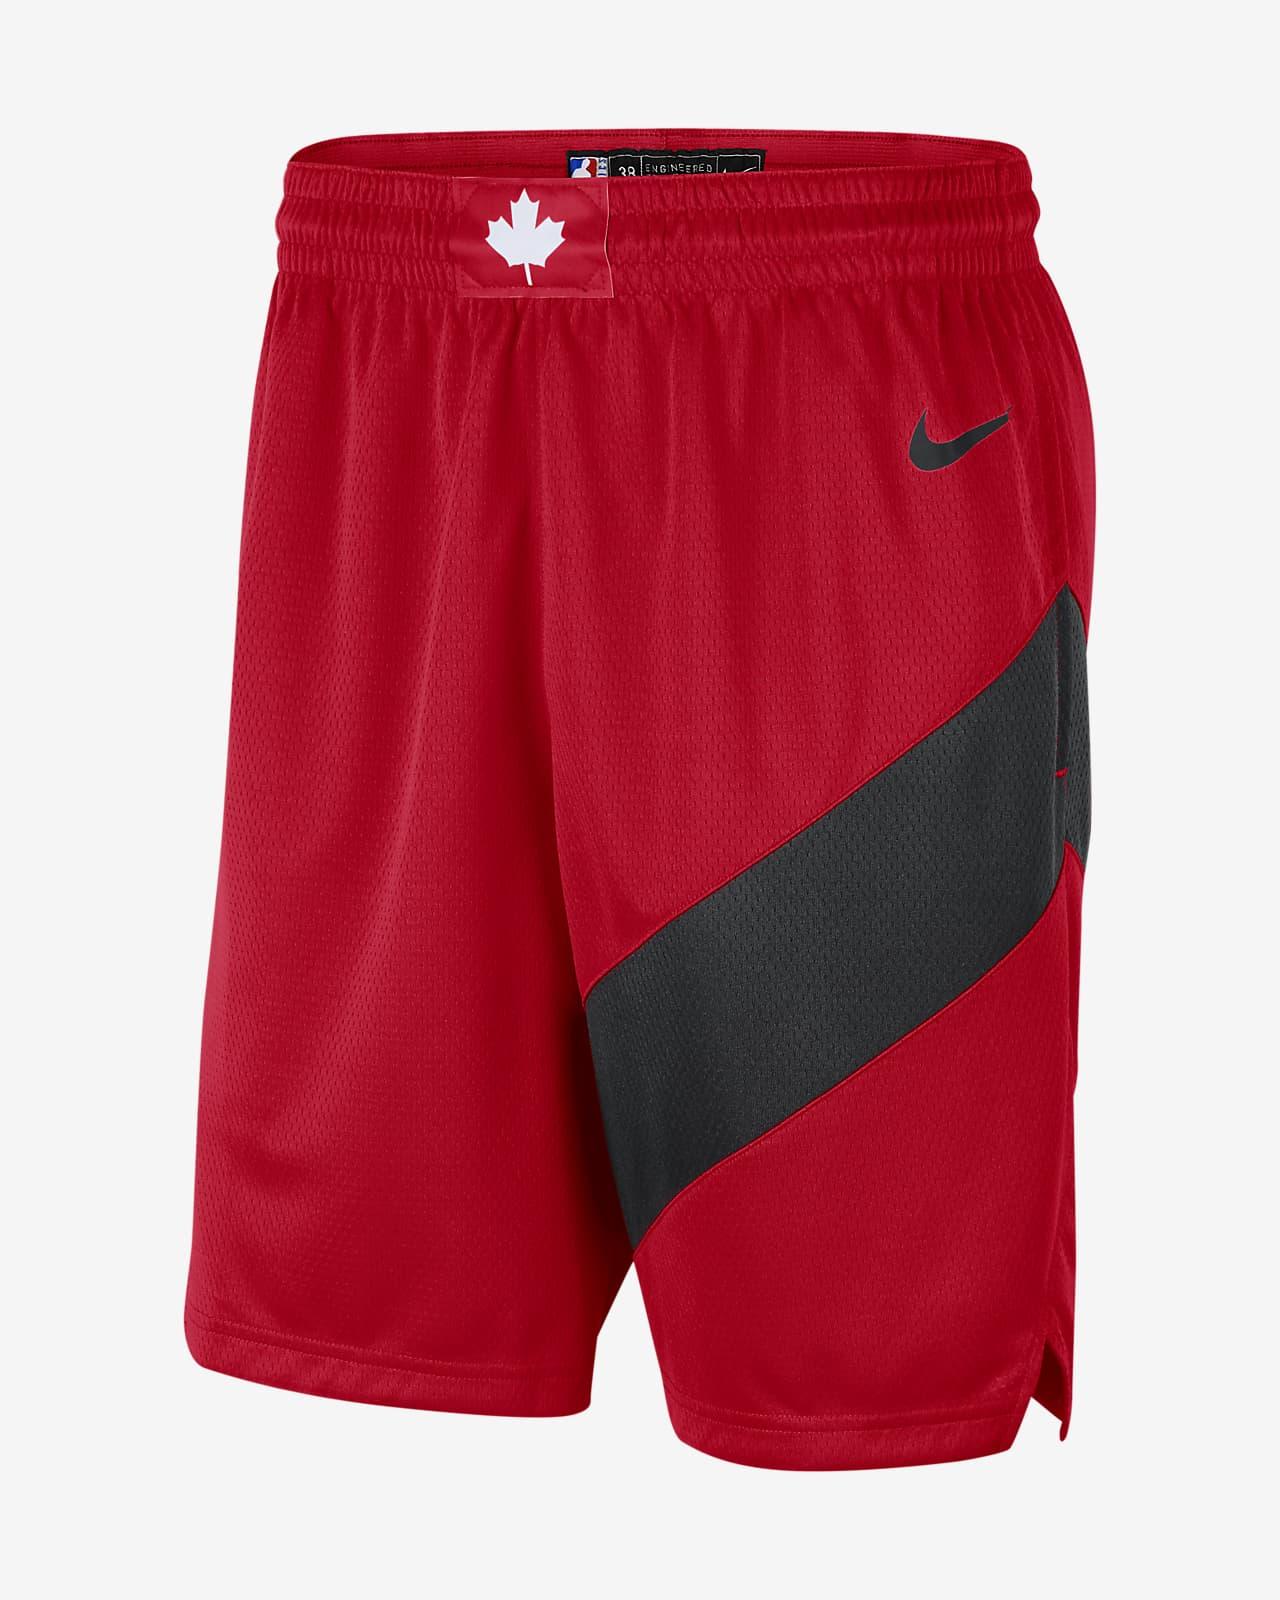 Raptors Icon Edition 2020 Men's Nike NBA Swingman Shorts